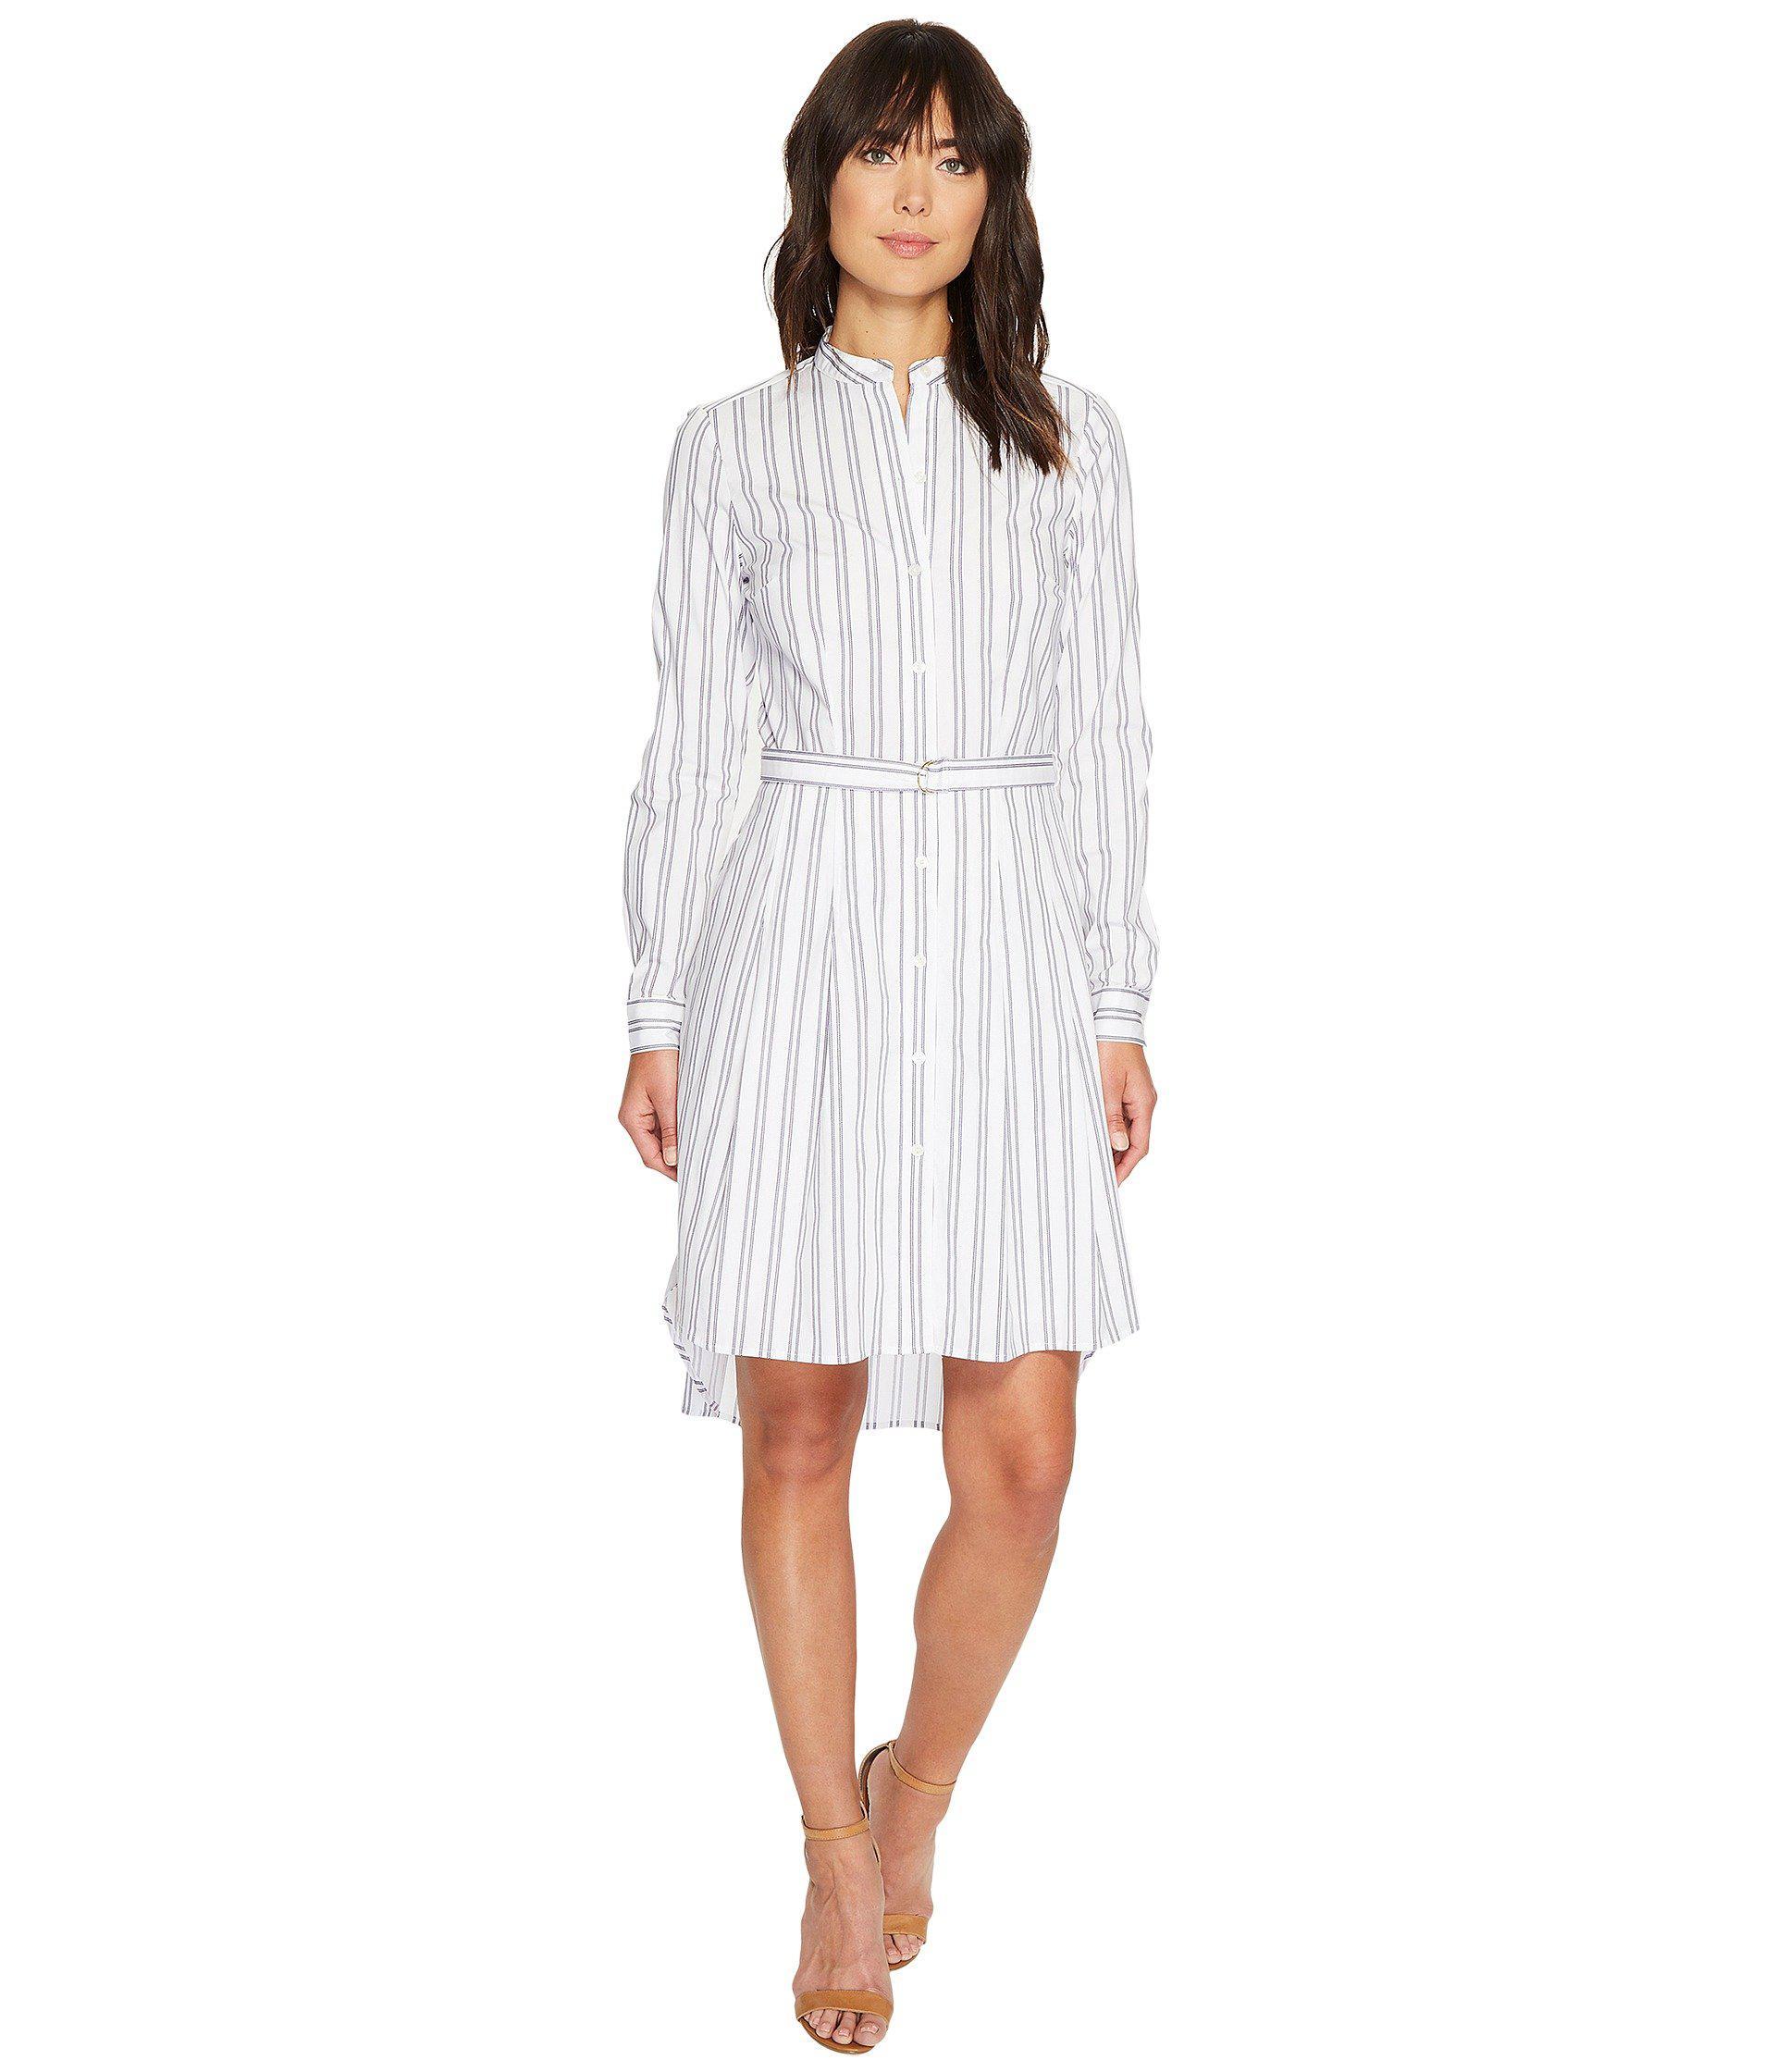 45712e6c13b Lyst - MICHAEL Michael Kors Bengal Stripe High-low Dress in White